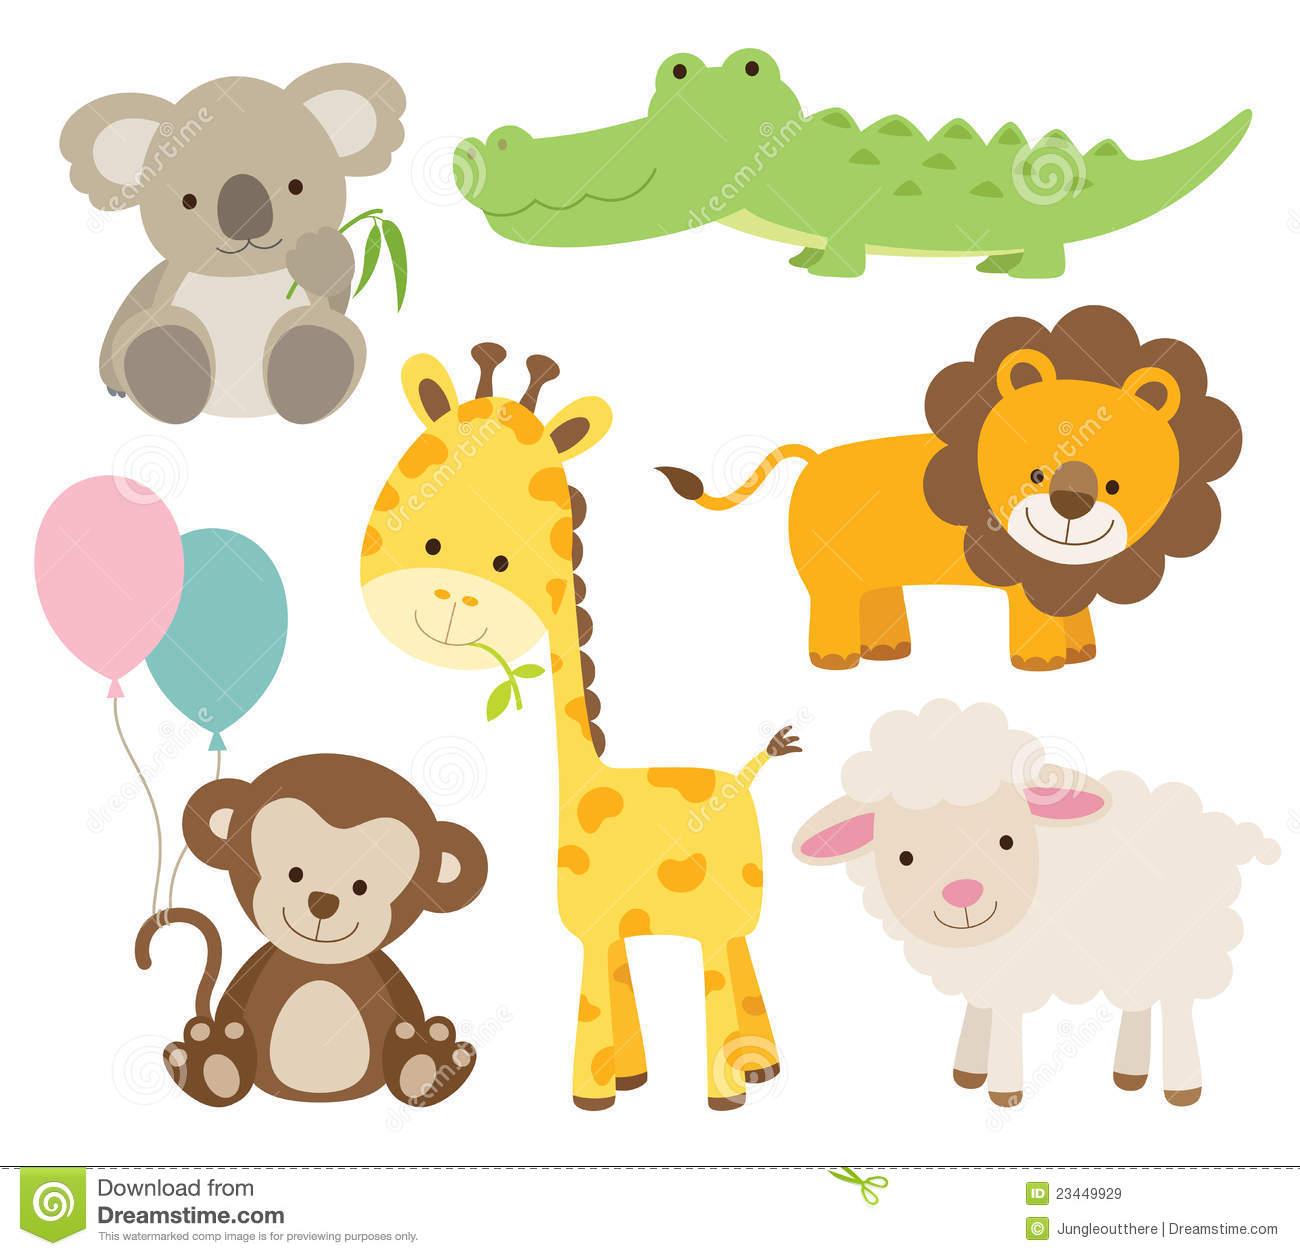 Animal clipart baby animal Animal Cute Art Animals Clip